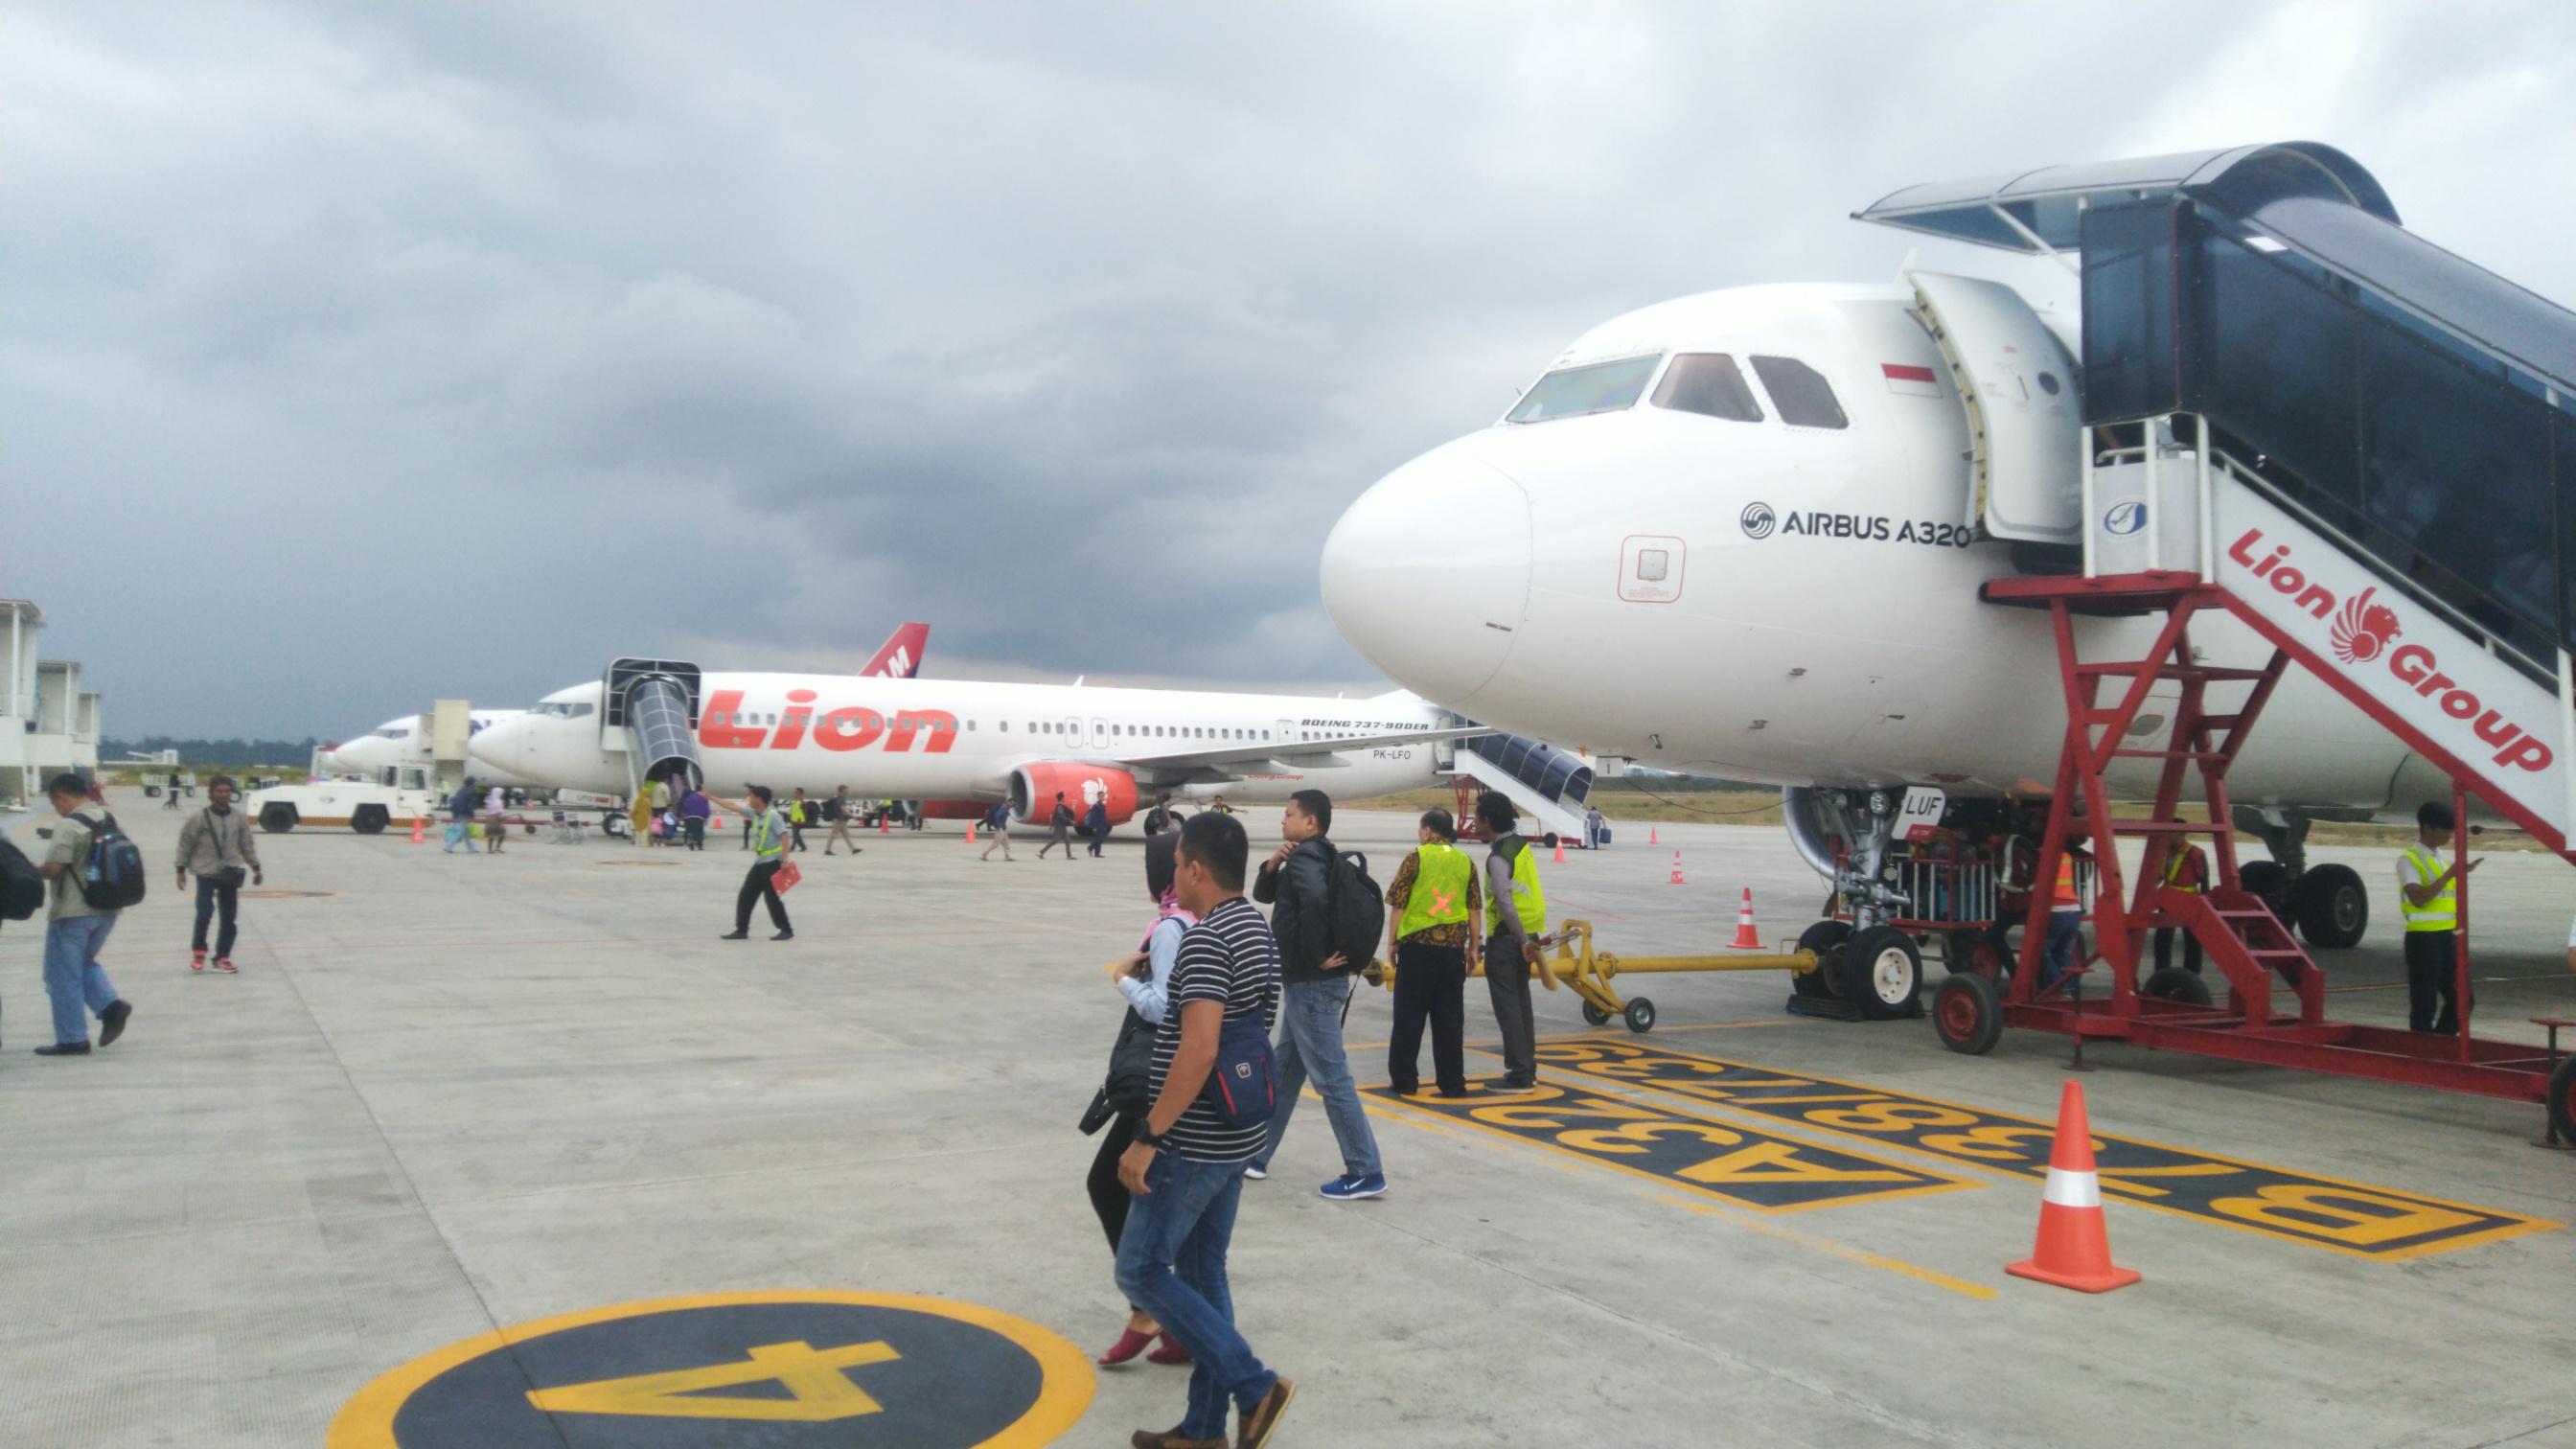 Berlaku Mulai Besok Tarif Tiket Pesawat 50 80 Dari Tarif Batas Atas Niaga Asia